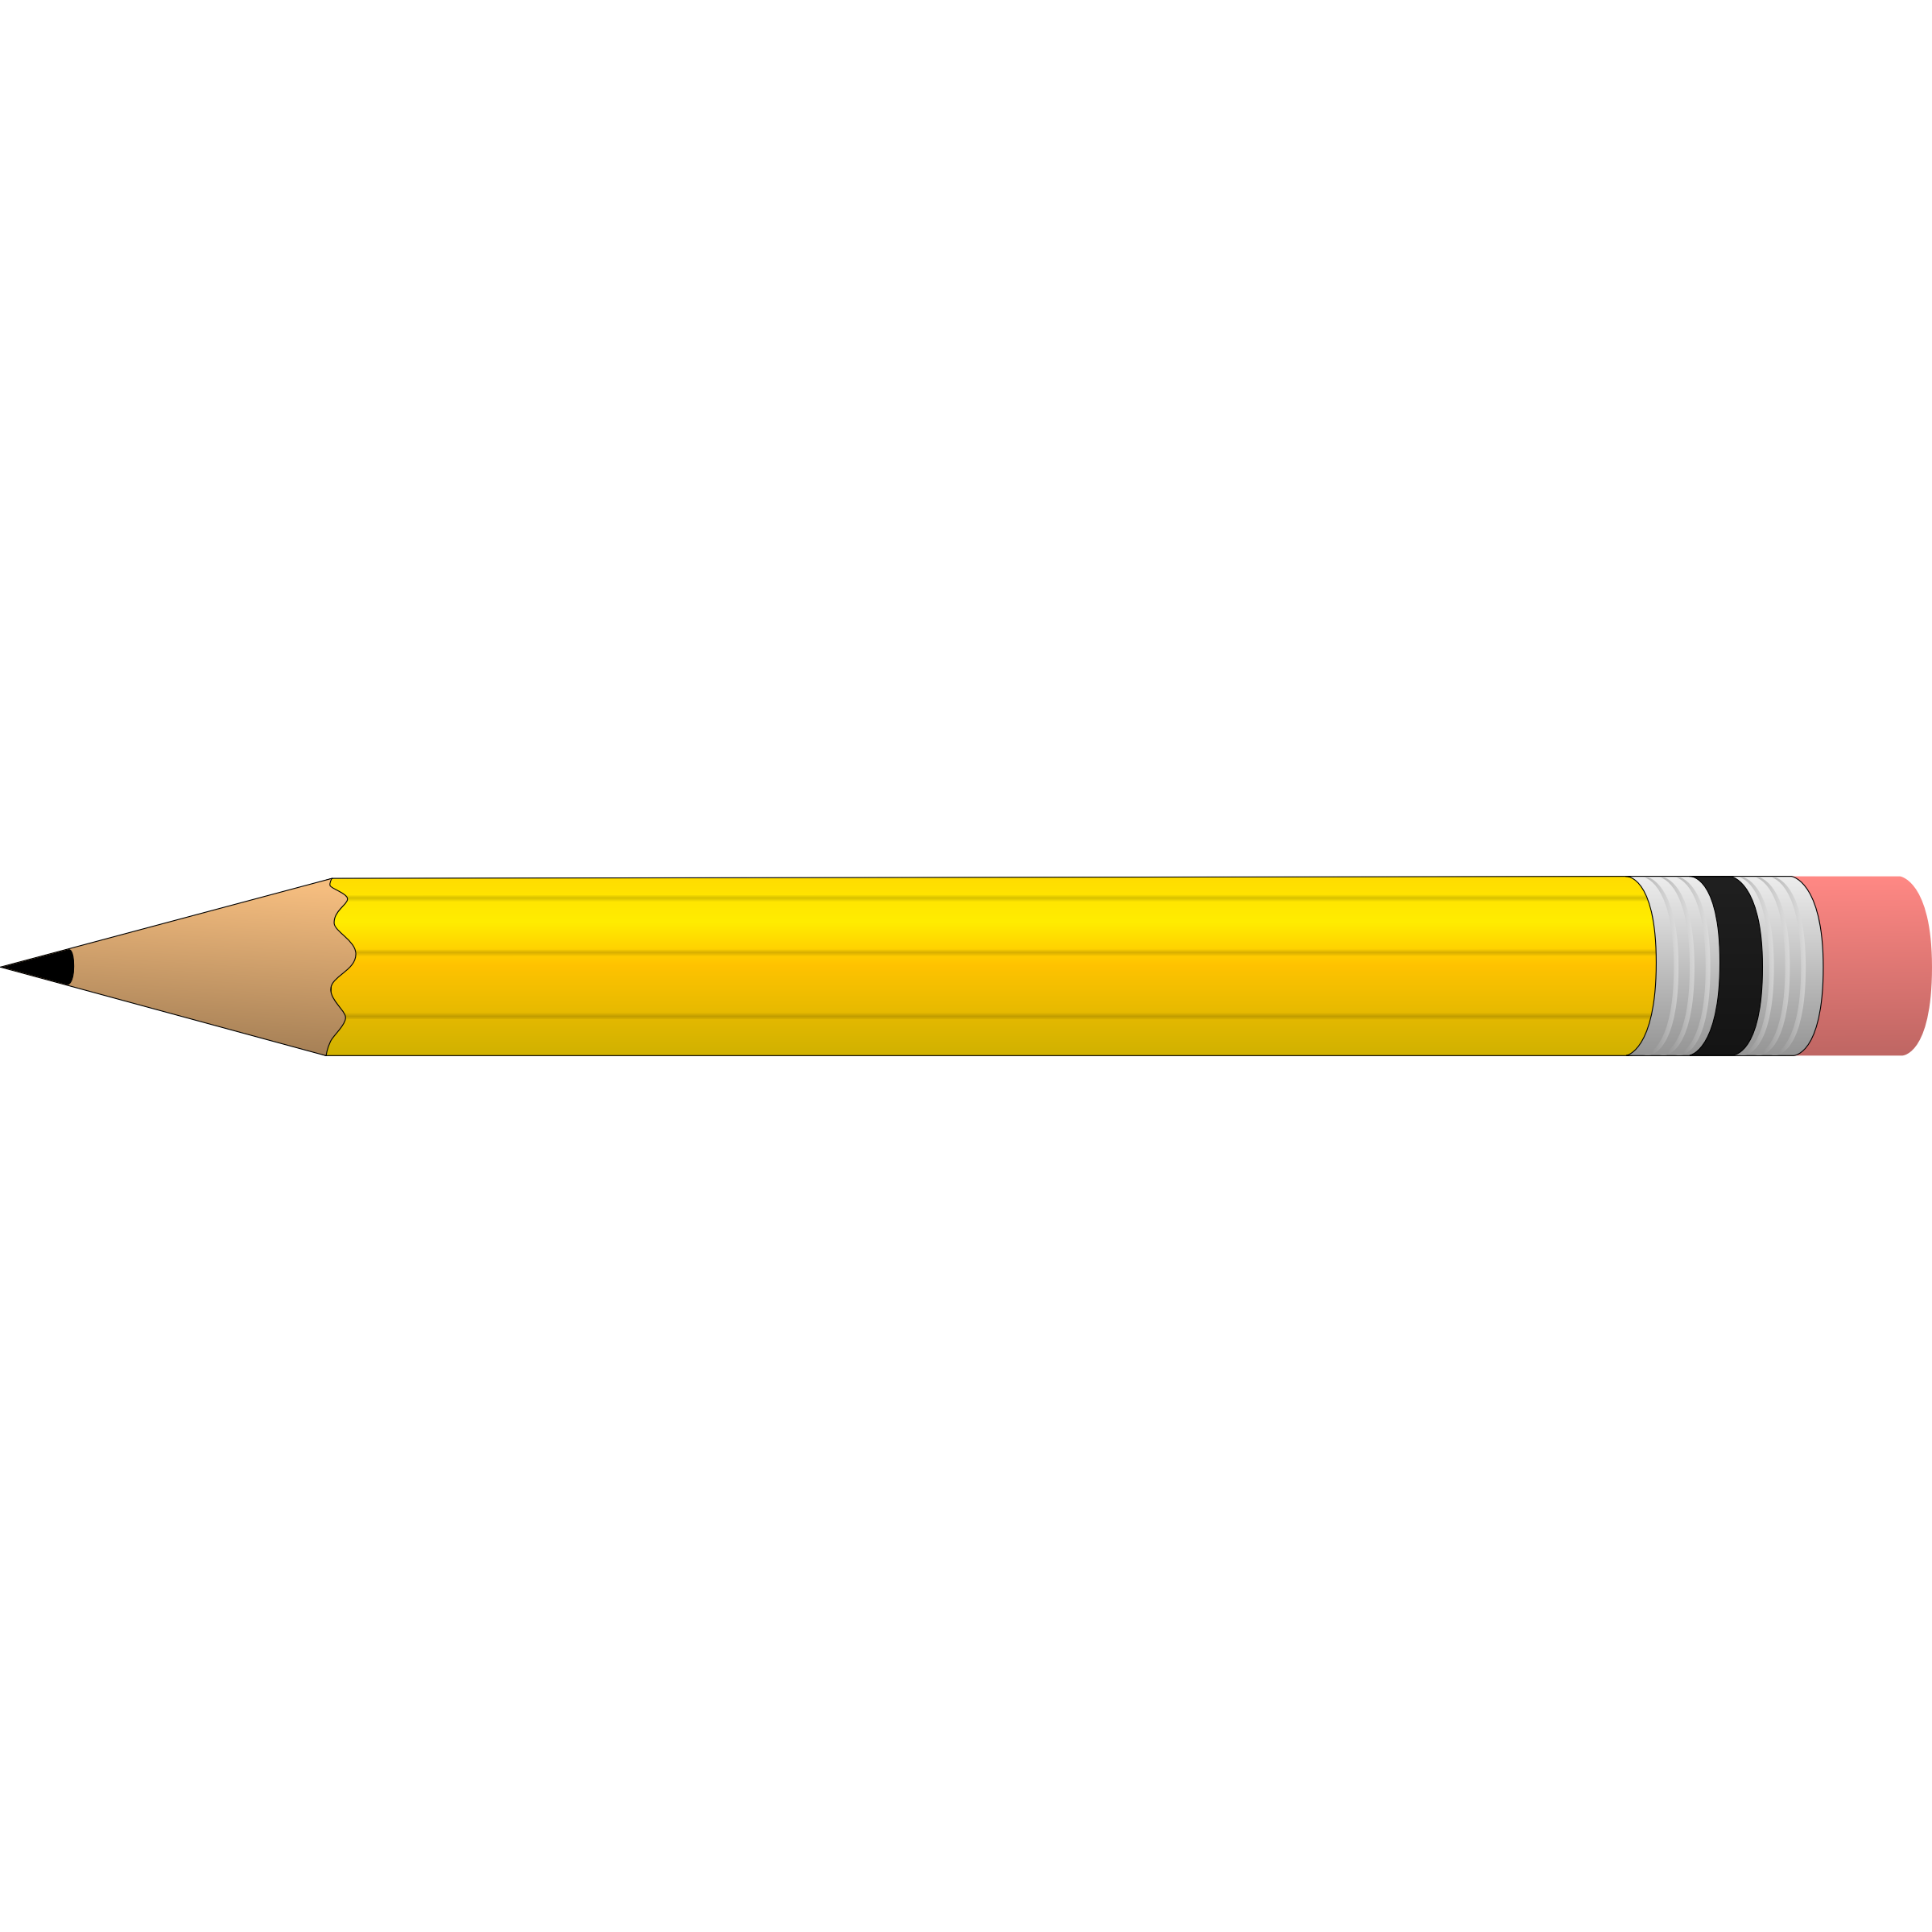 Mechanical Pencil Cliparts.